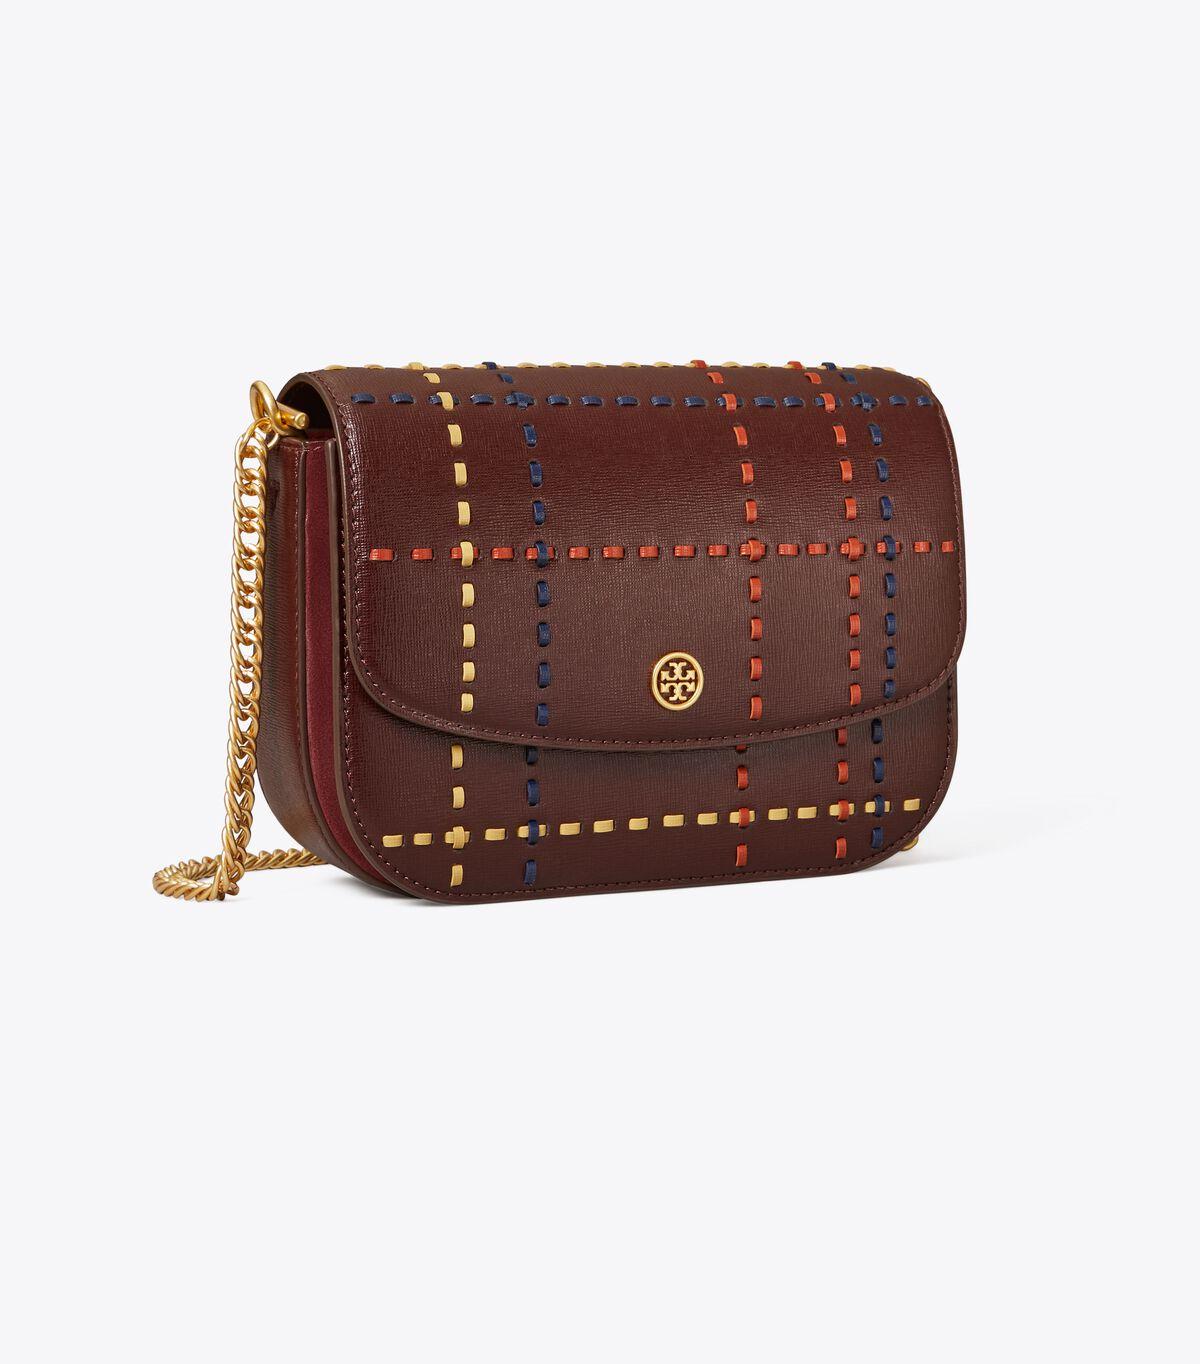 Robinson Woven Plaid Convertible Shoulder Bag